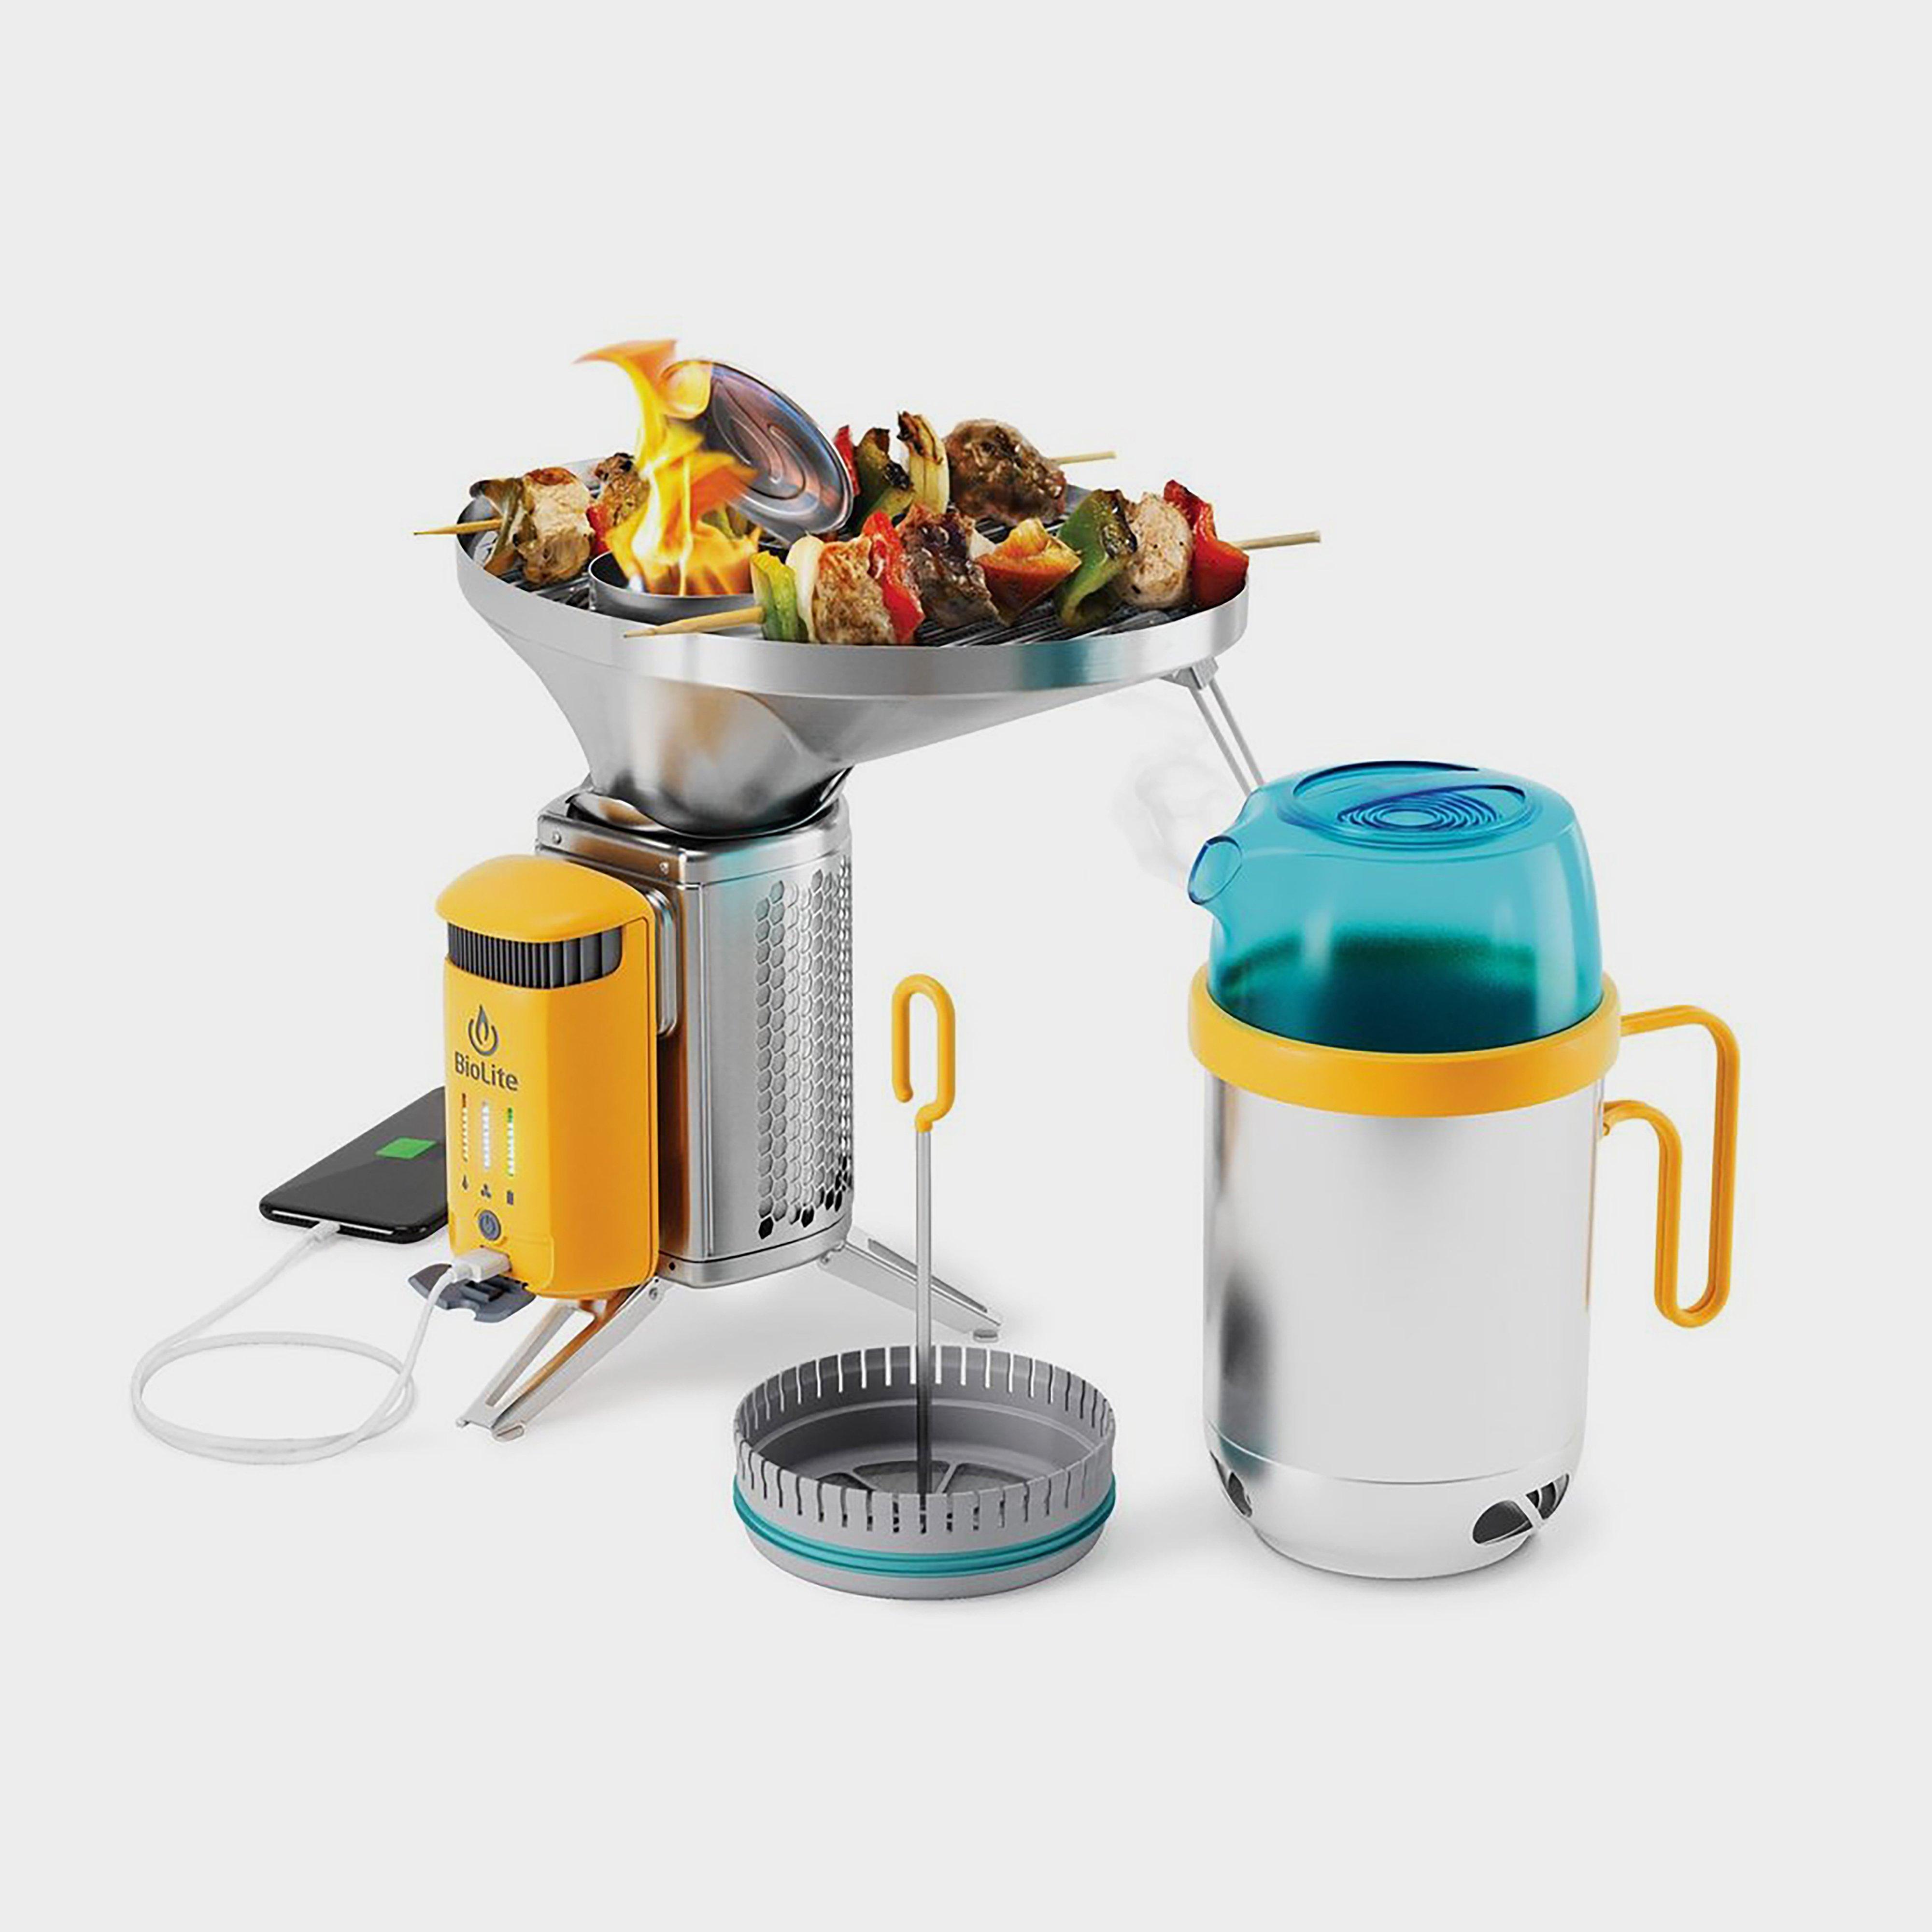 Biolite Biolite Campstove 2+ Complete Cook Kit - Silver/silver  Silver/silver